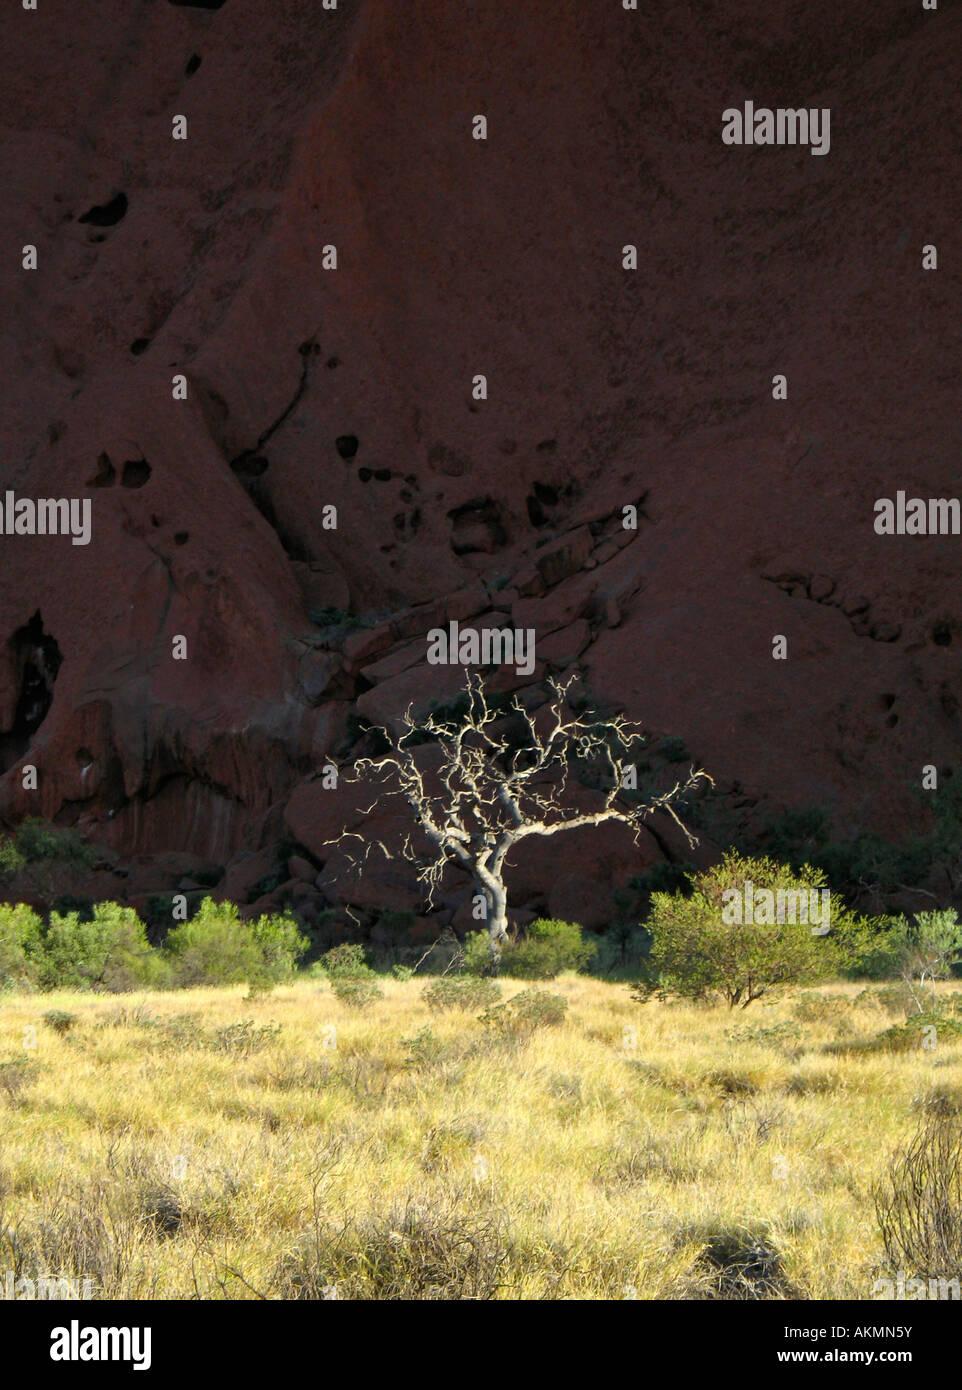 lone tree in front of uluru - Stock Image